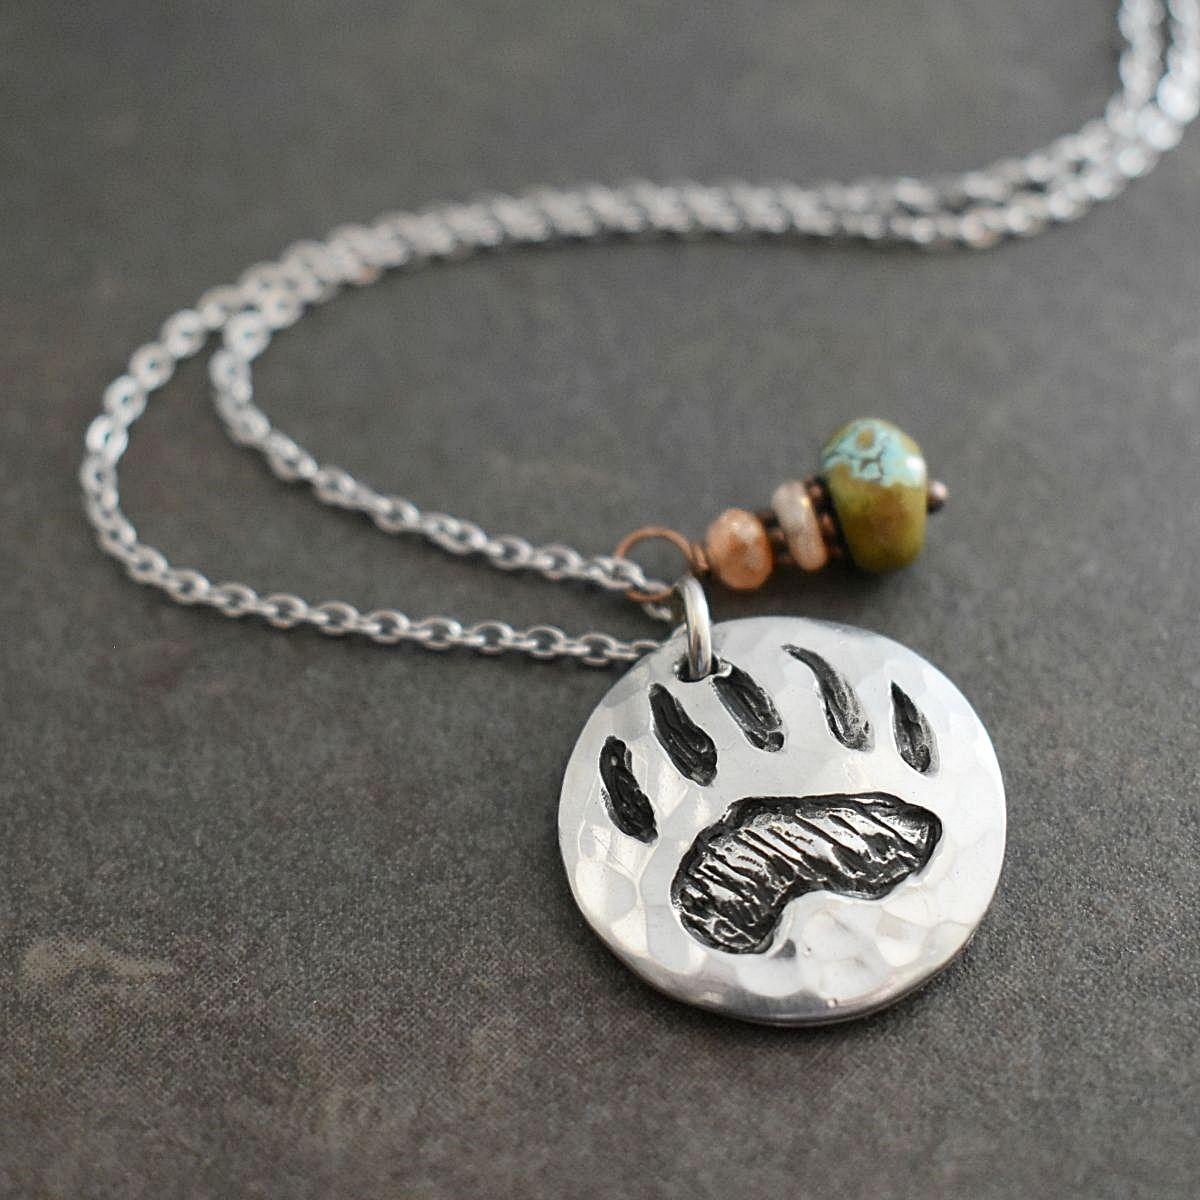 Bear track jewelry